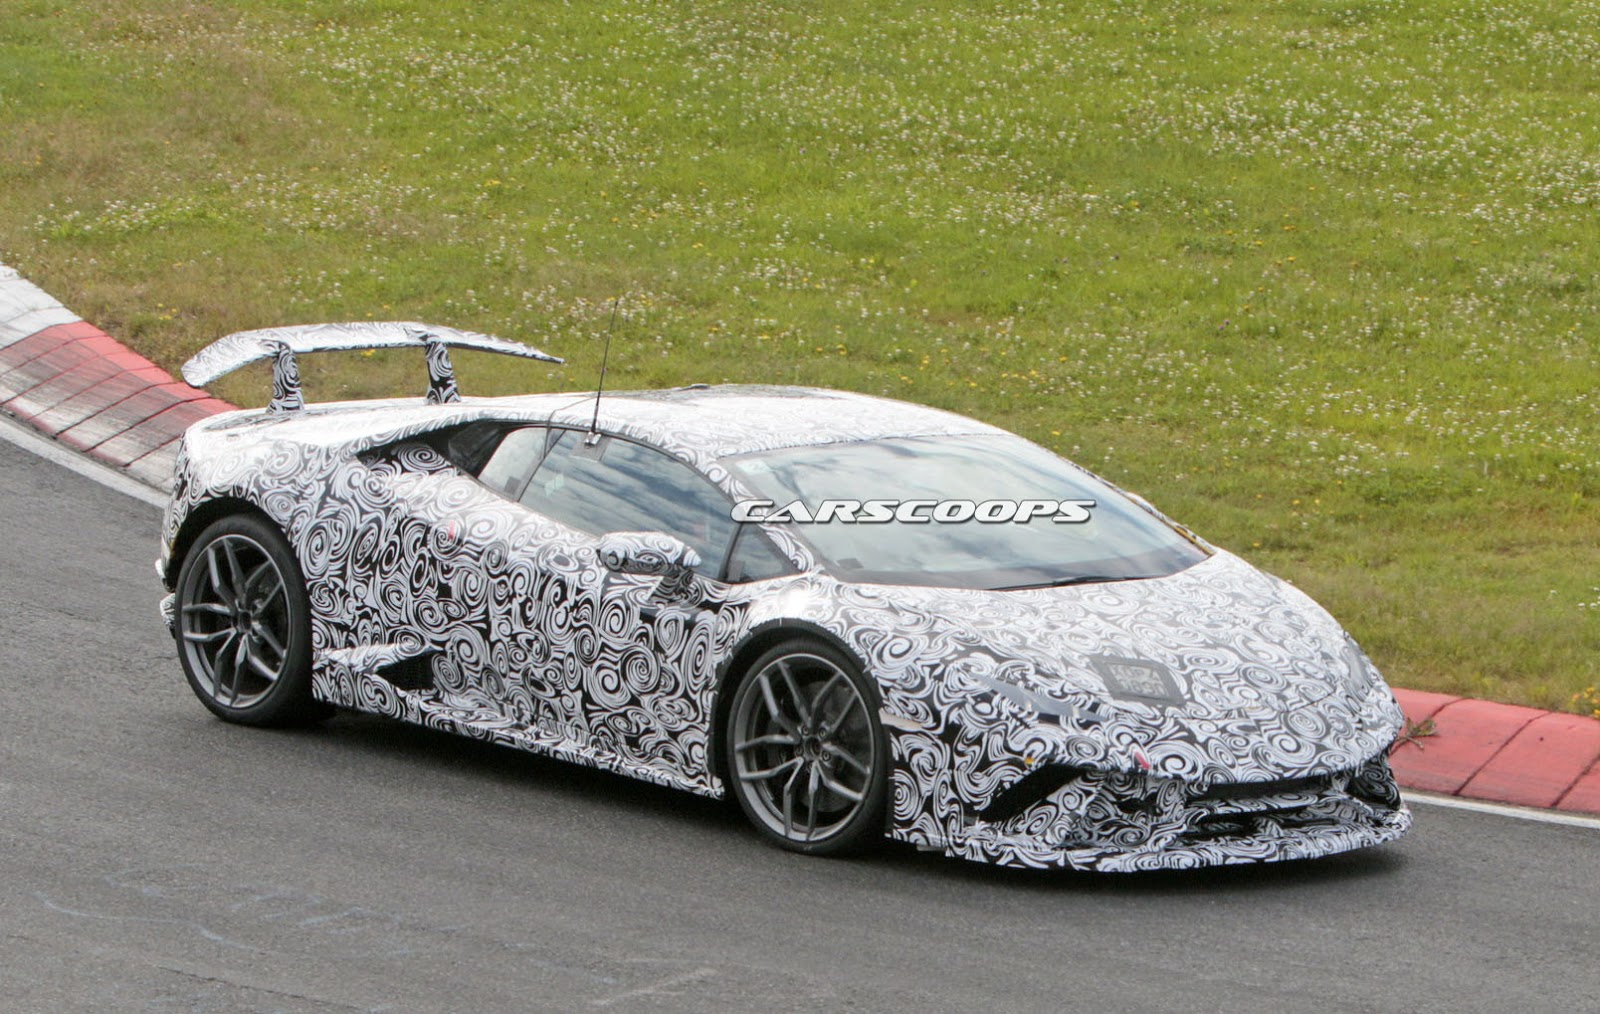 2017 Lamborghini Huracan Superleggera Is Coming To Get You Carscoops